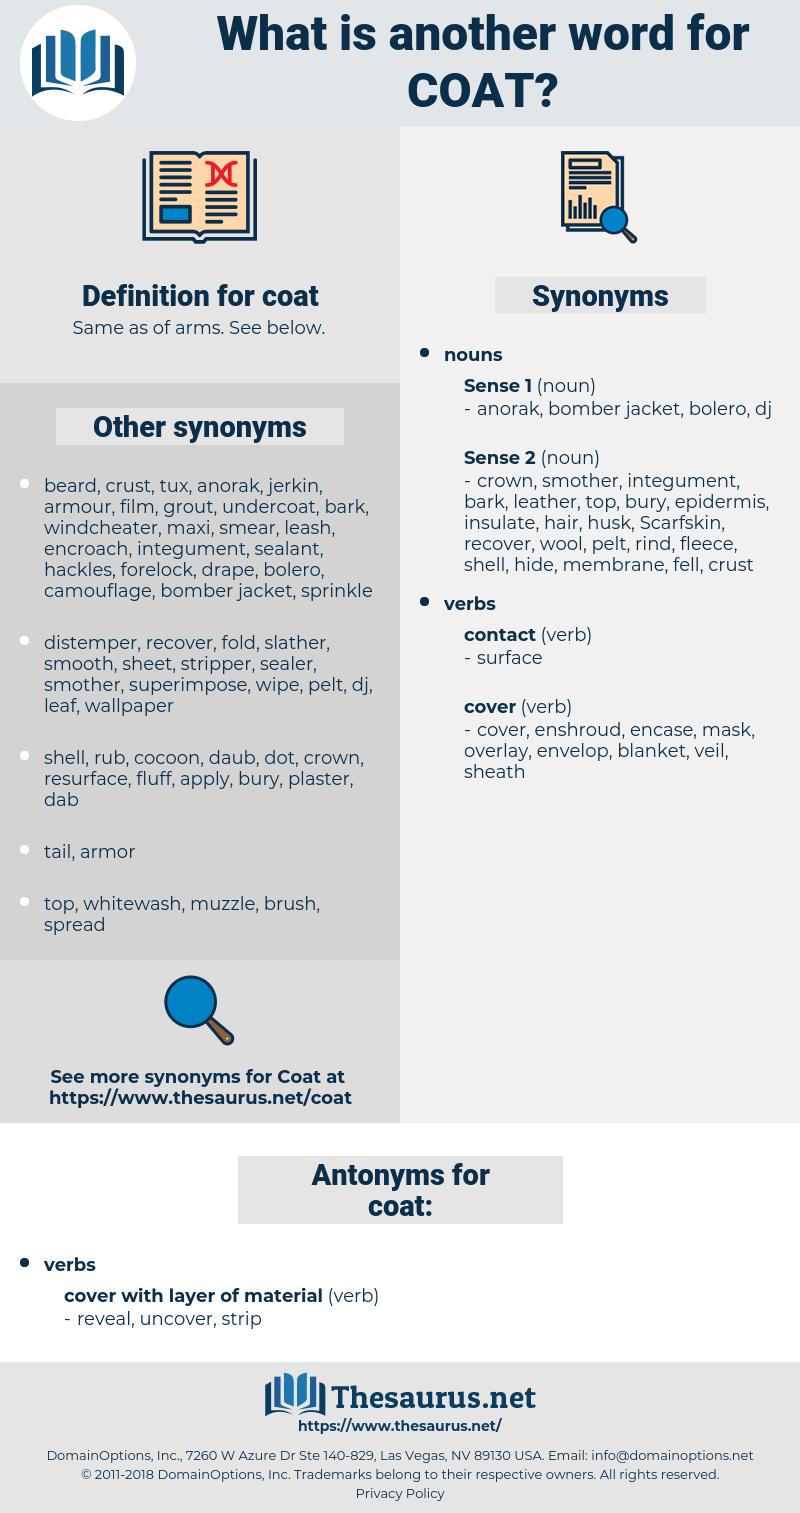 coat, synonym coat, another word for coat, words like coat, thesaurus coat